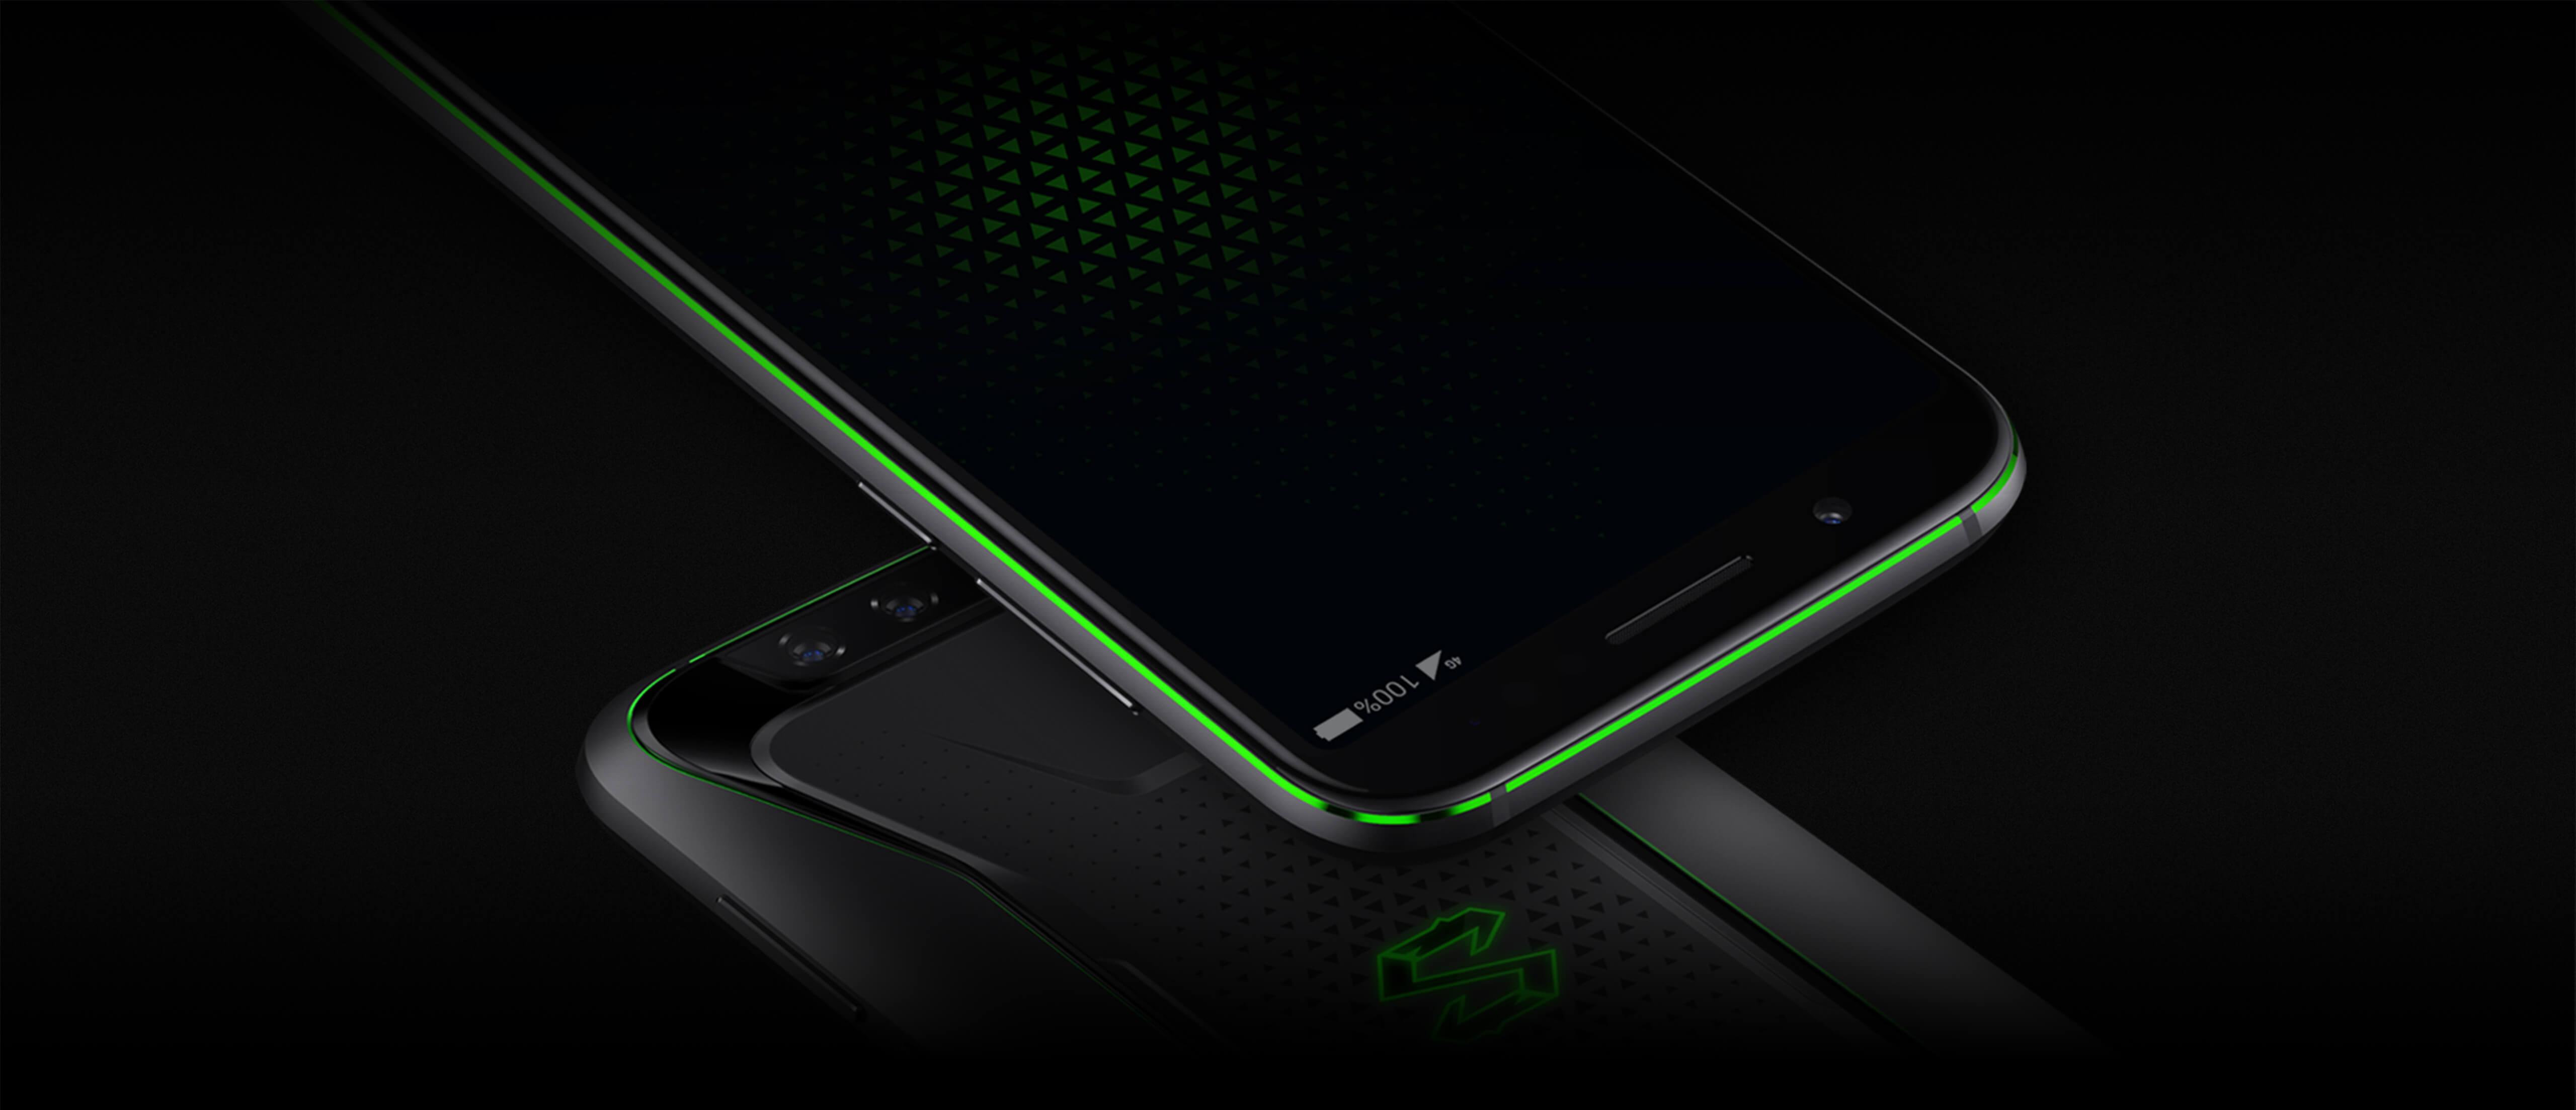 Xiaomi Blackshark Testbericht Gaming Smartphone Samples 1